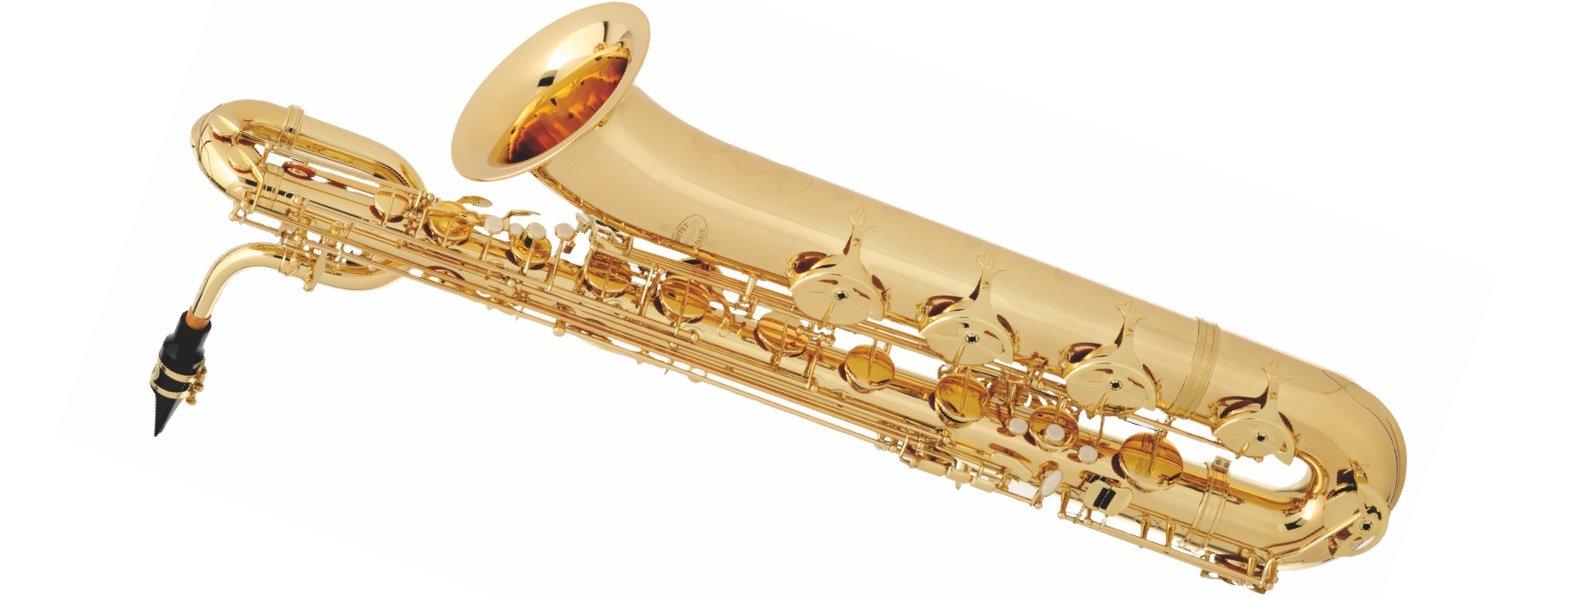 Buffet-Crampon 400 Series Baritone Saxophone